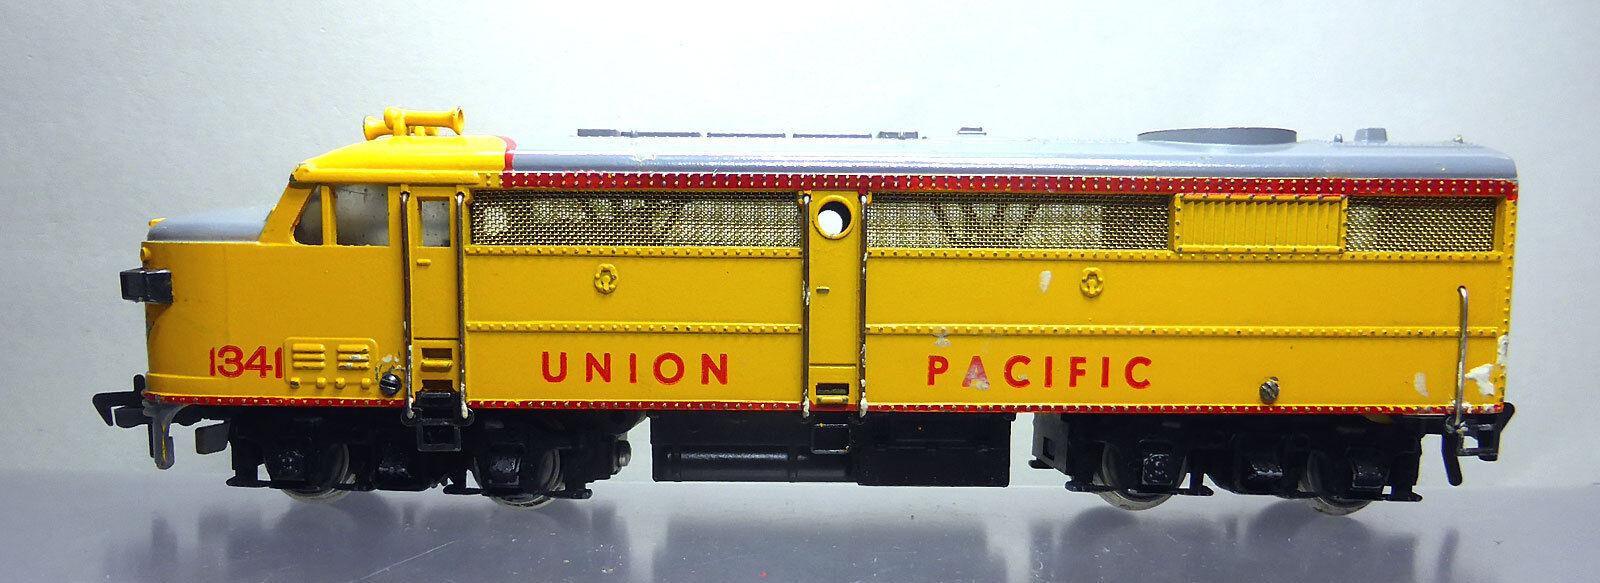 Fleischmann 1341u-1, US diesellok Alco Union Pacific RR, metal c868